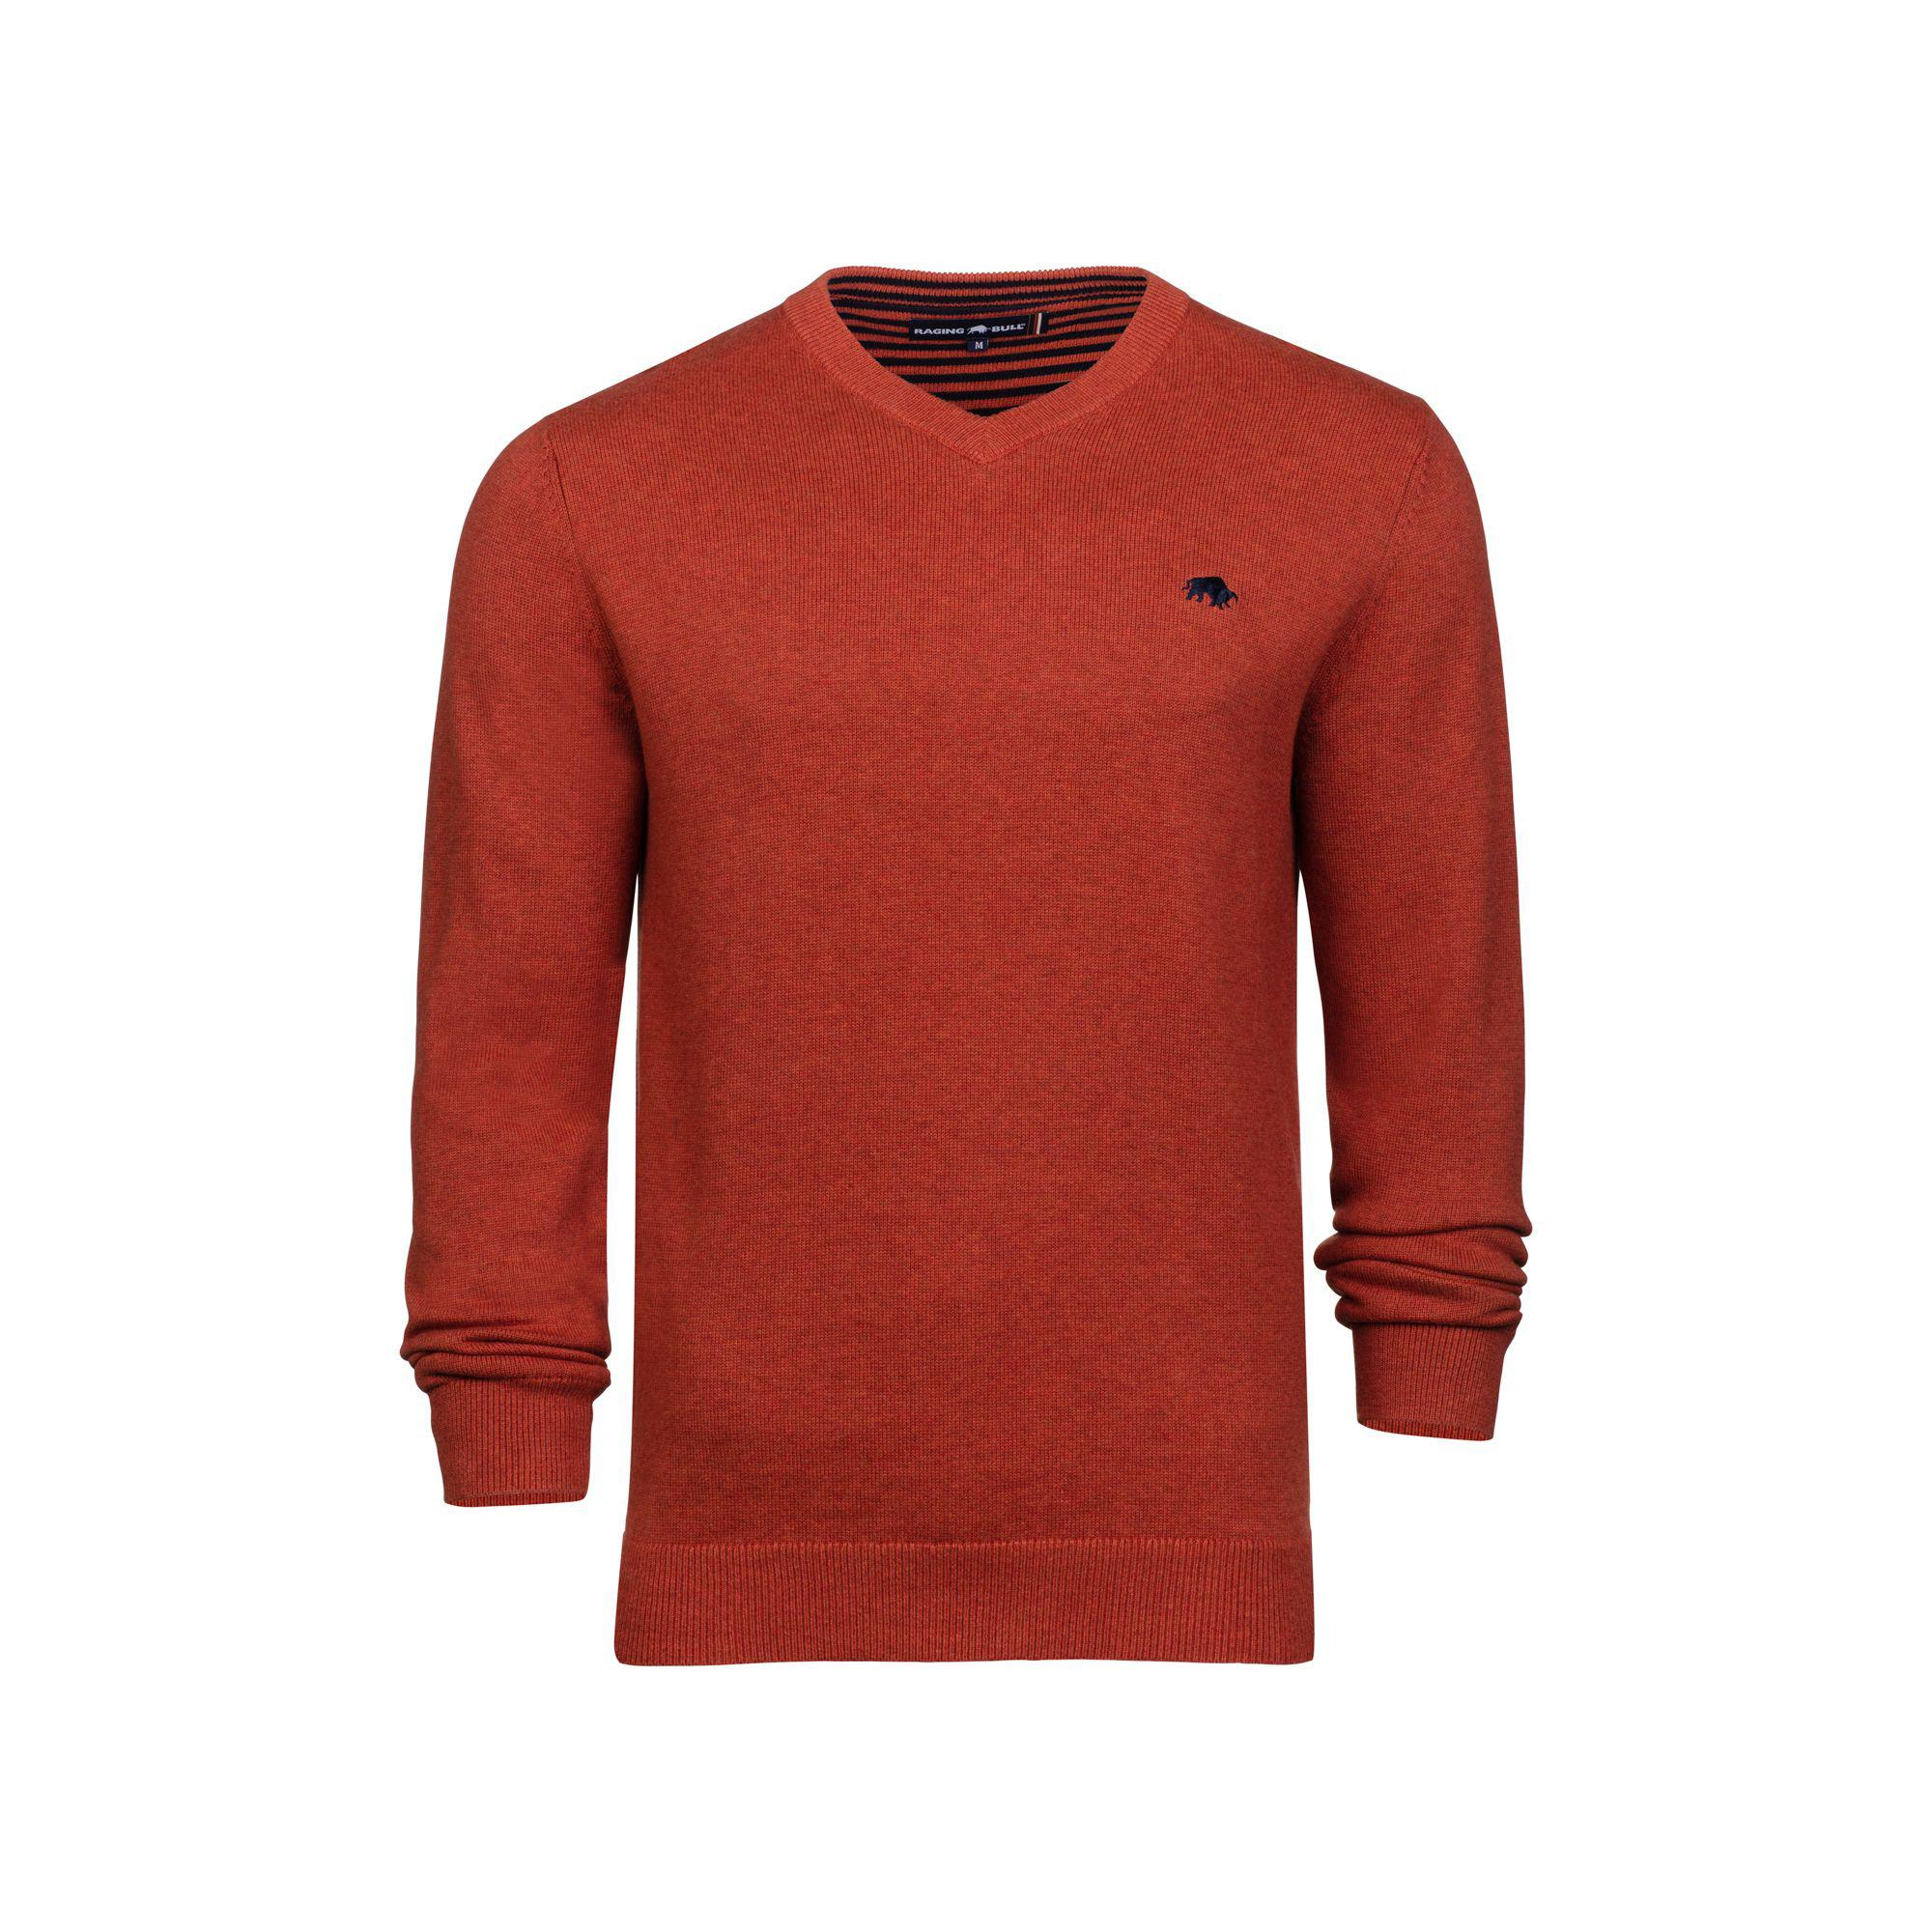 de011167a23571 Raging Bull Orange V-neck Cotton And Cashmere Sweater in Orange for ...